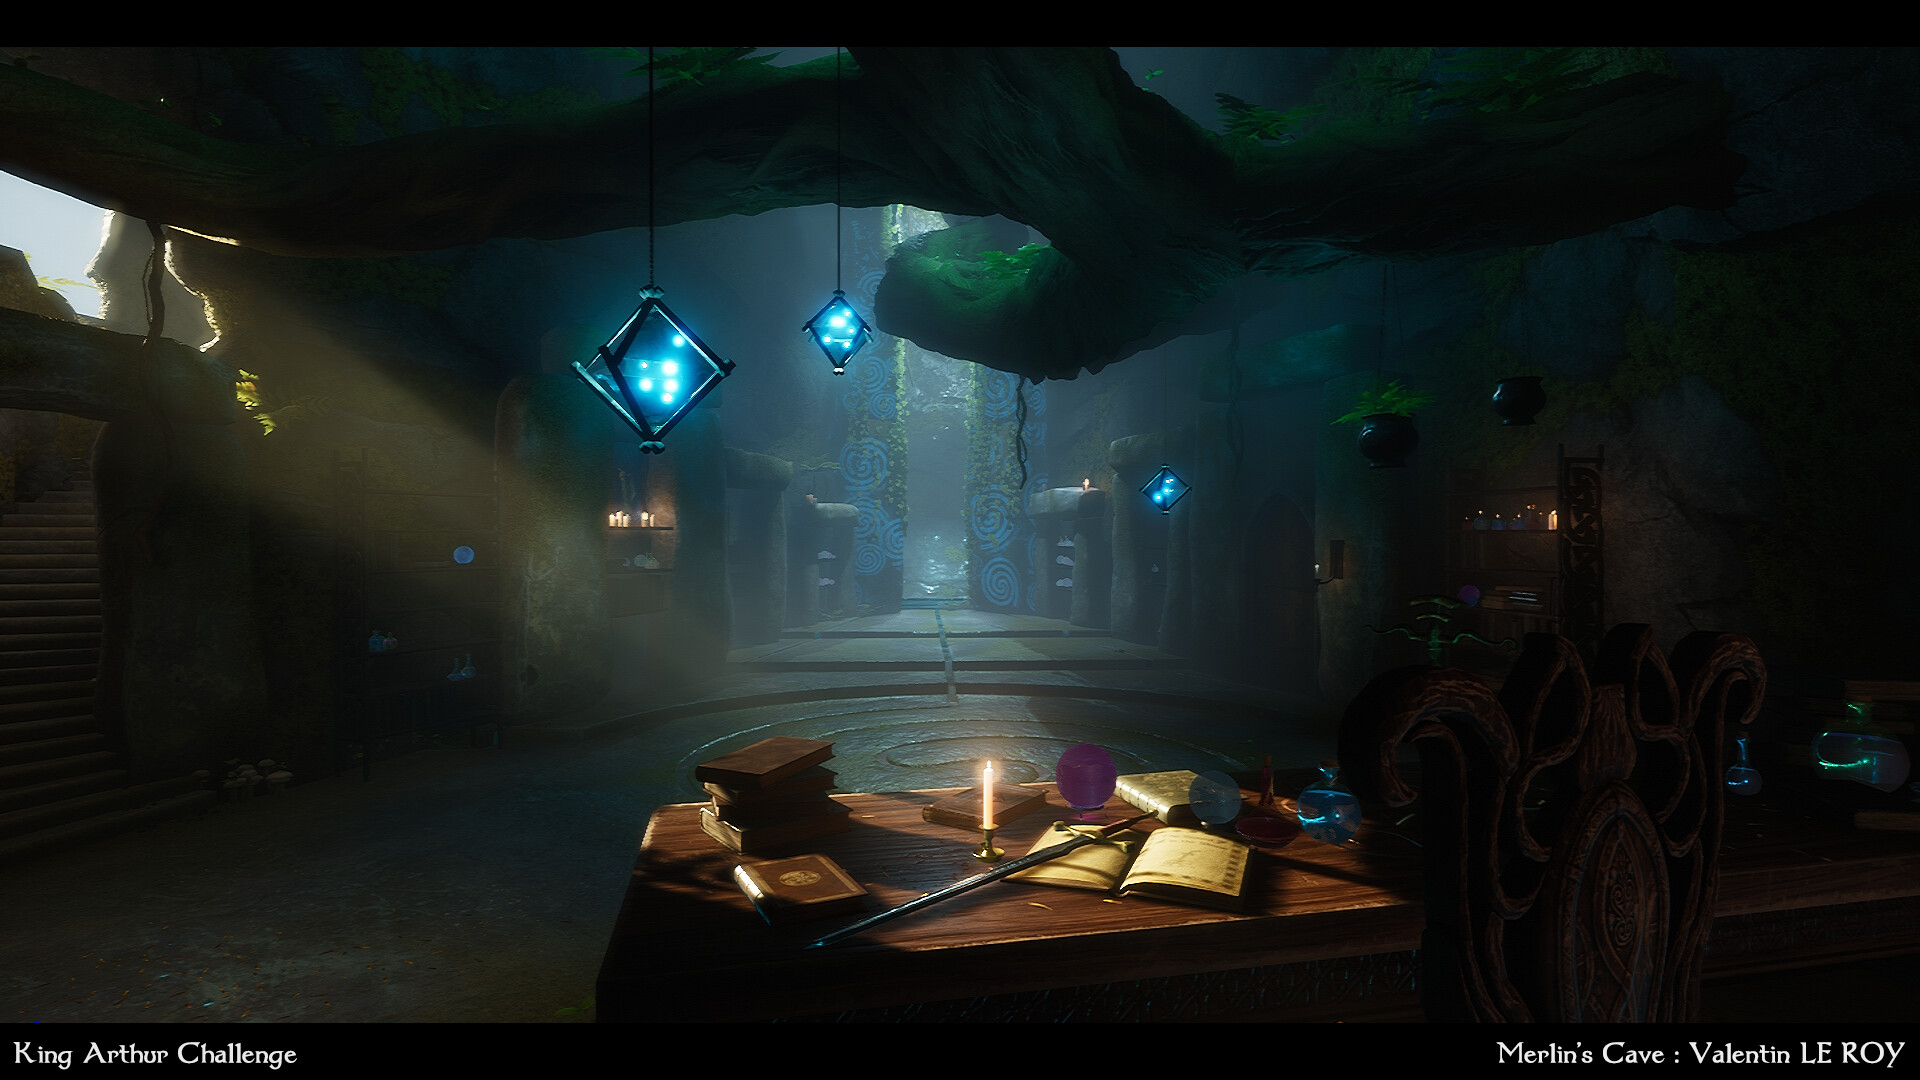 cave artstation environment challenge